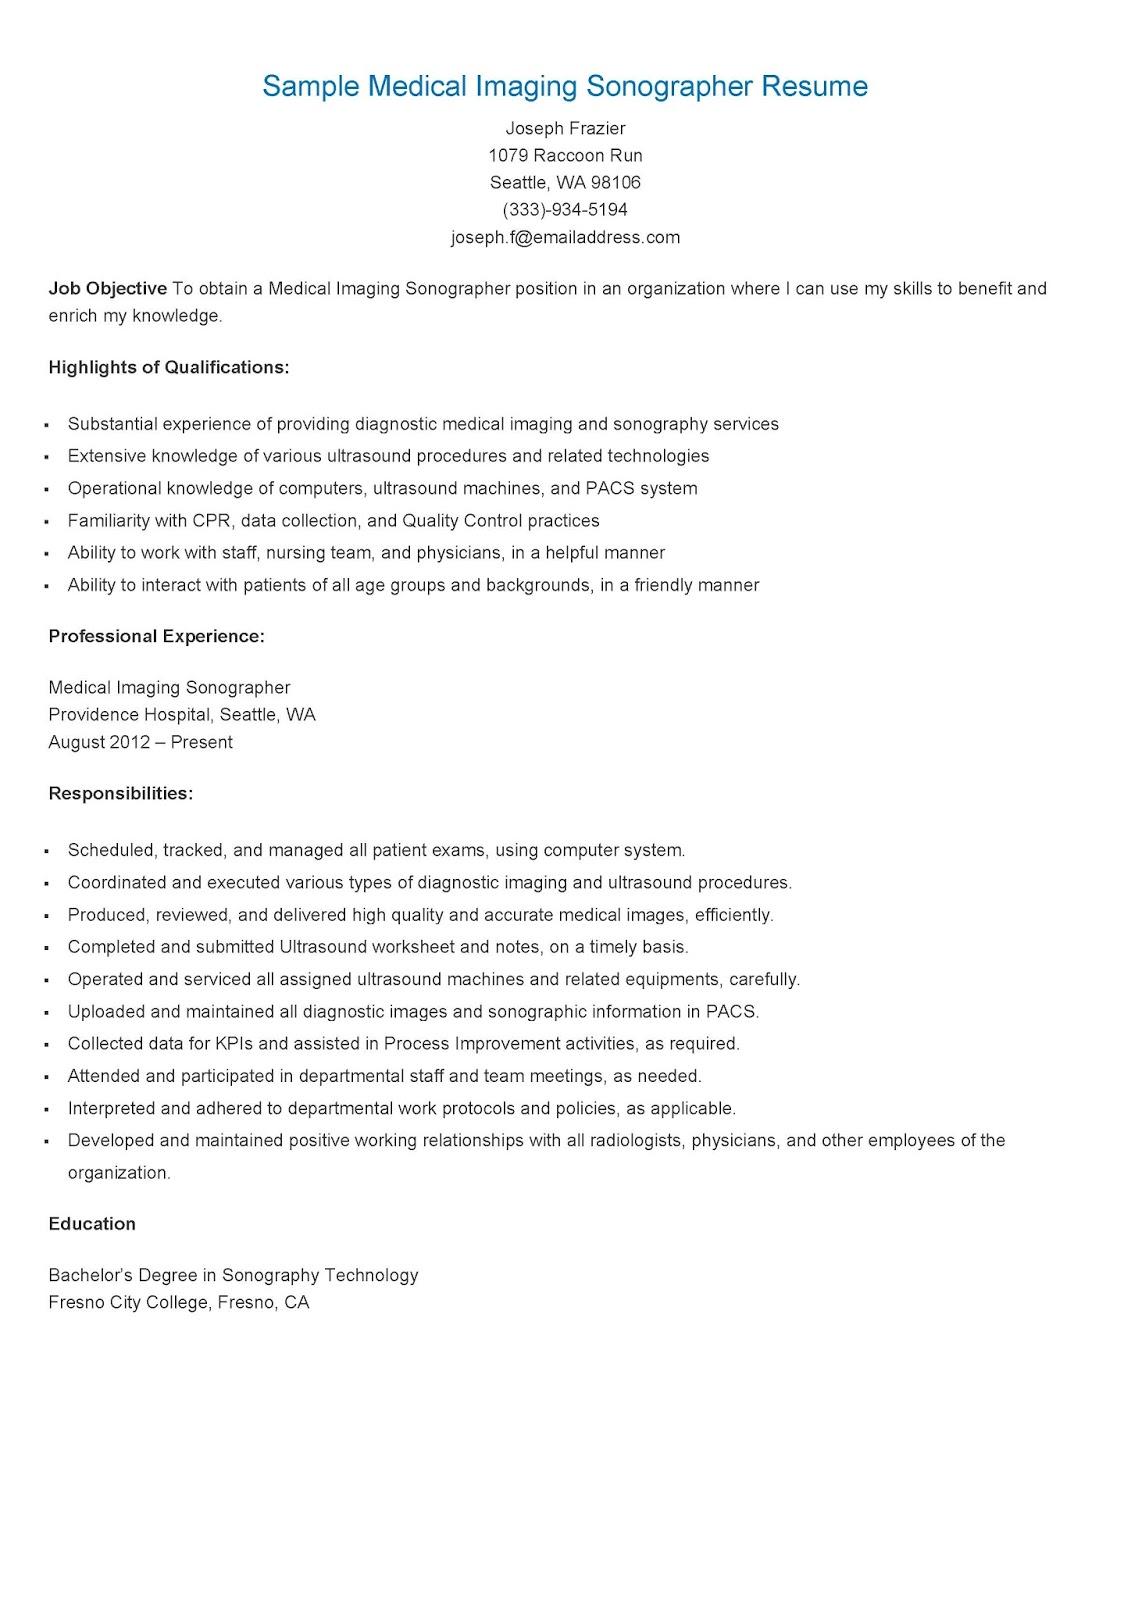 resume samples  sample medical imaging sonographer resume